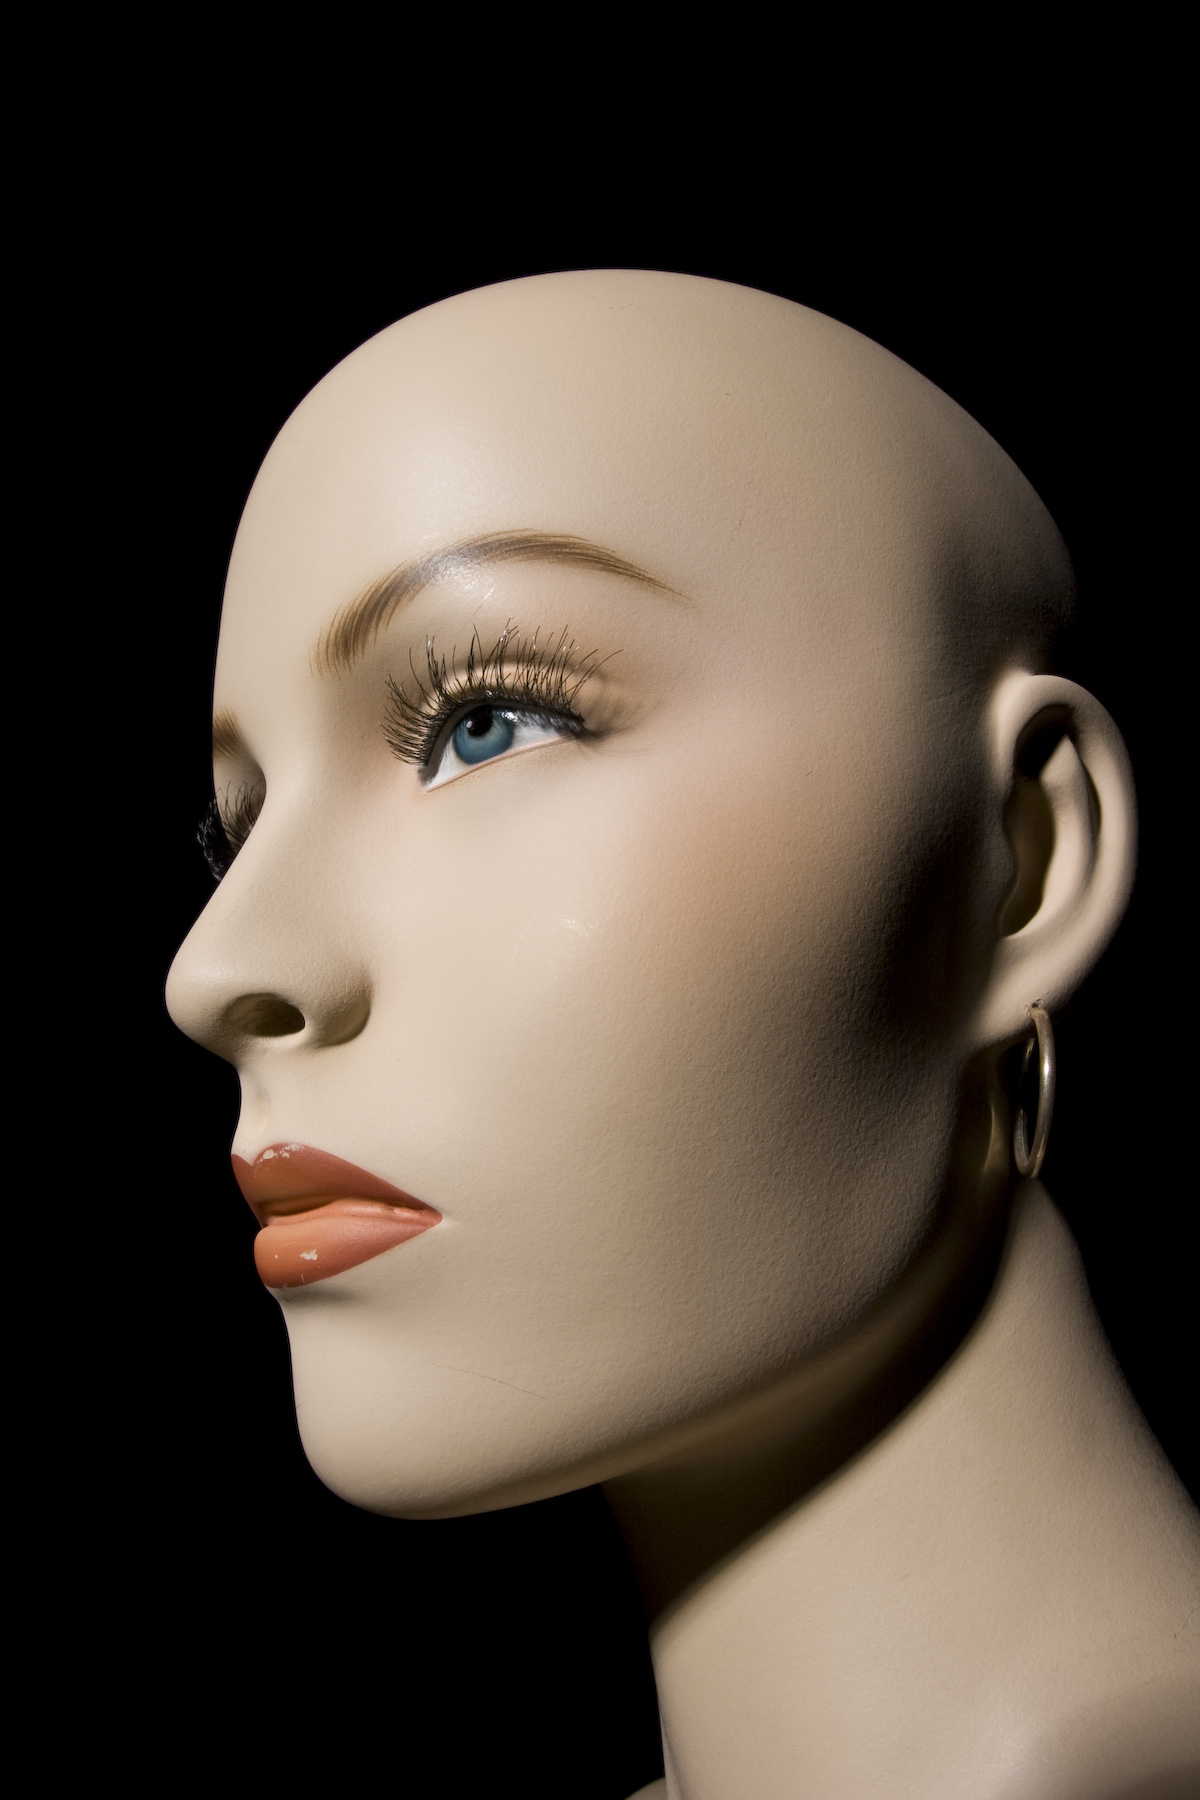 Mannequin, Art, Nude, Studio, Smooth, HQ Photo